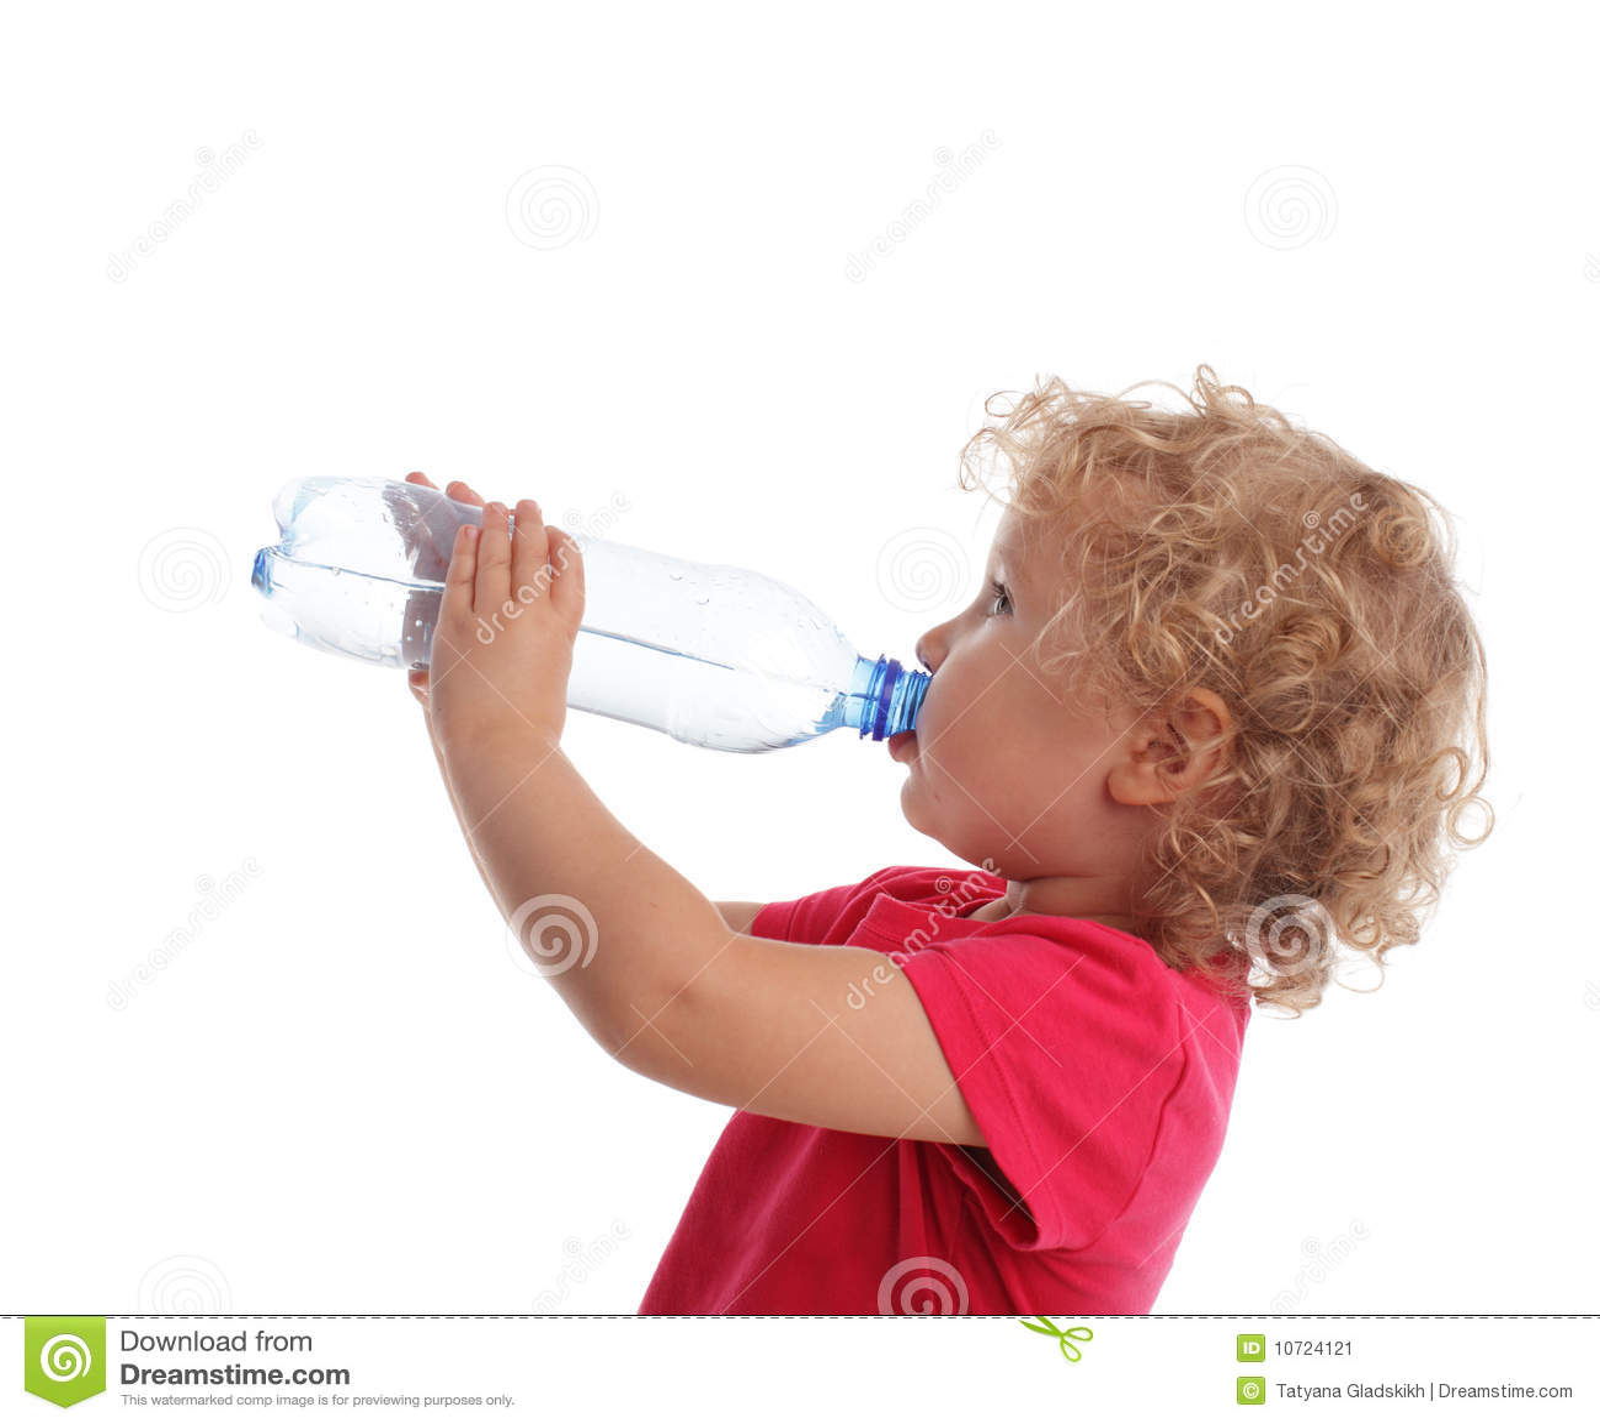 Промывание желудка ребенку фото